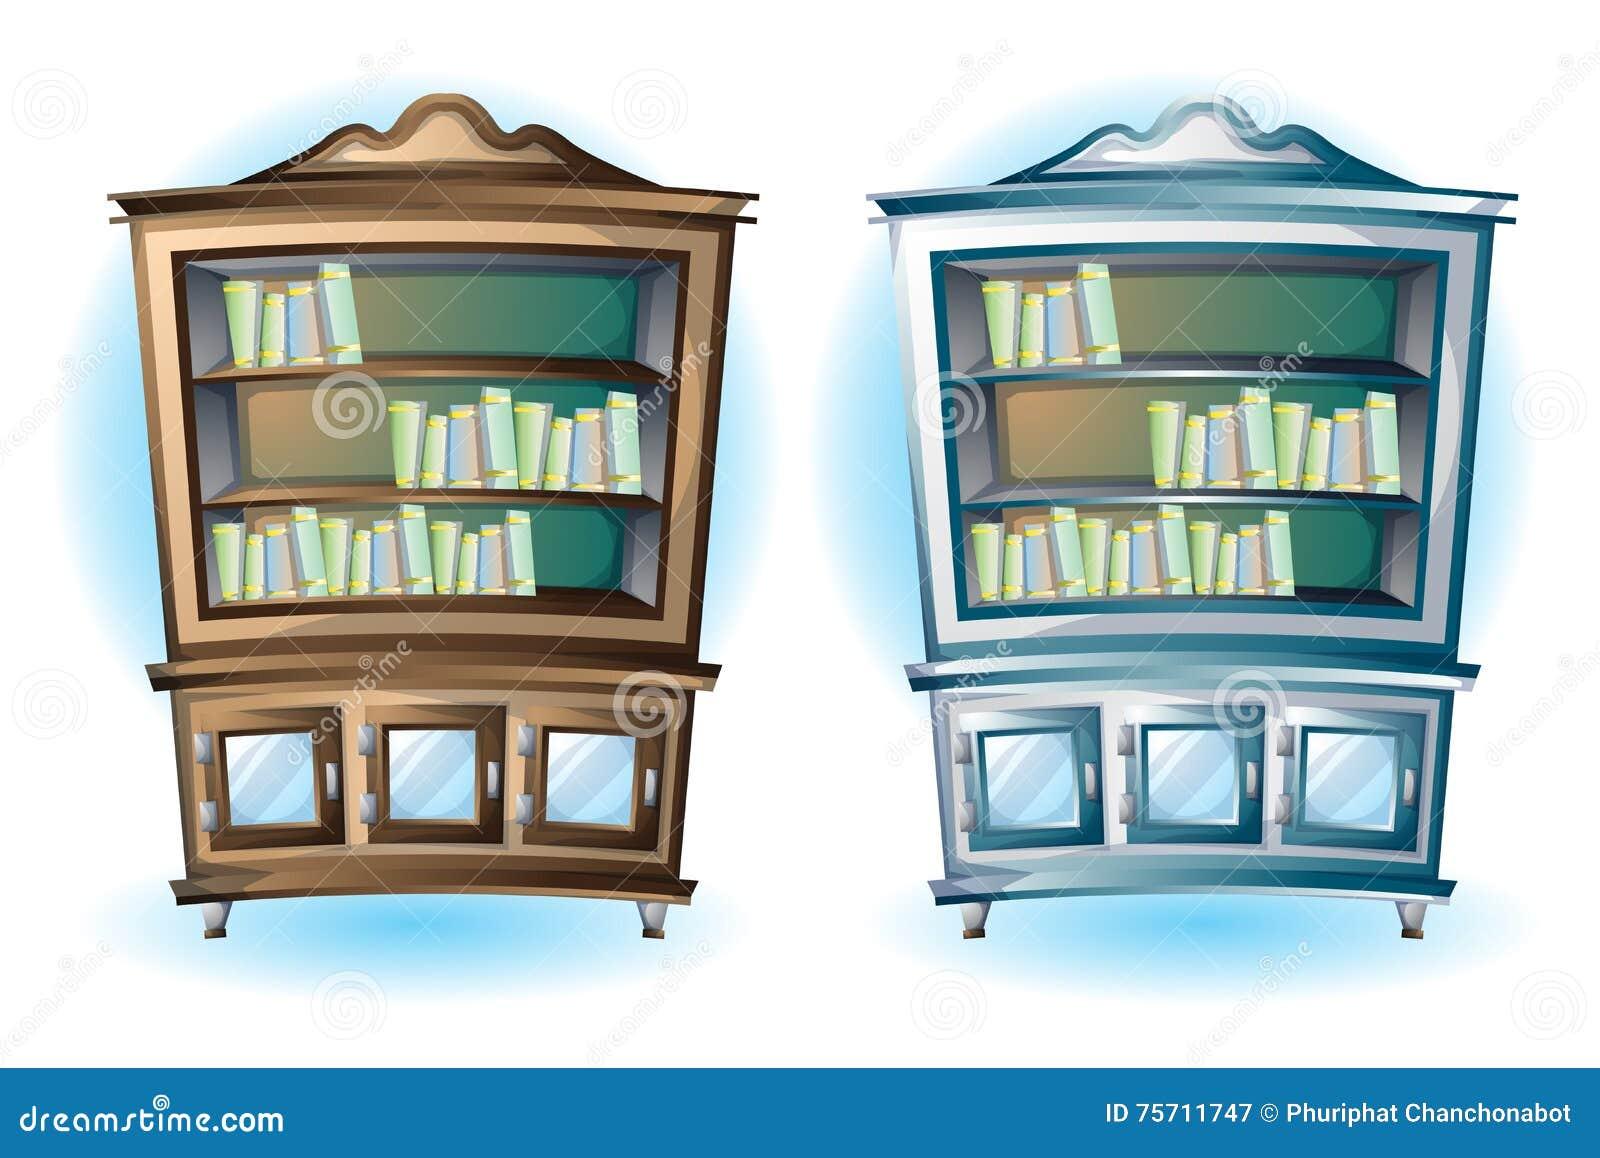 Interior wooden shelves free vector - Cabinet Cartoon Illustration Interior Vector Wood